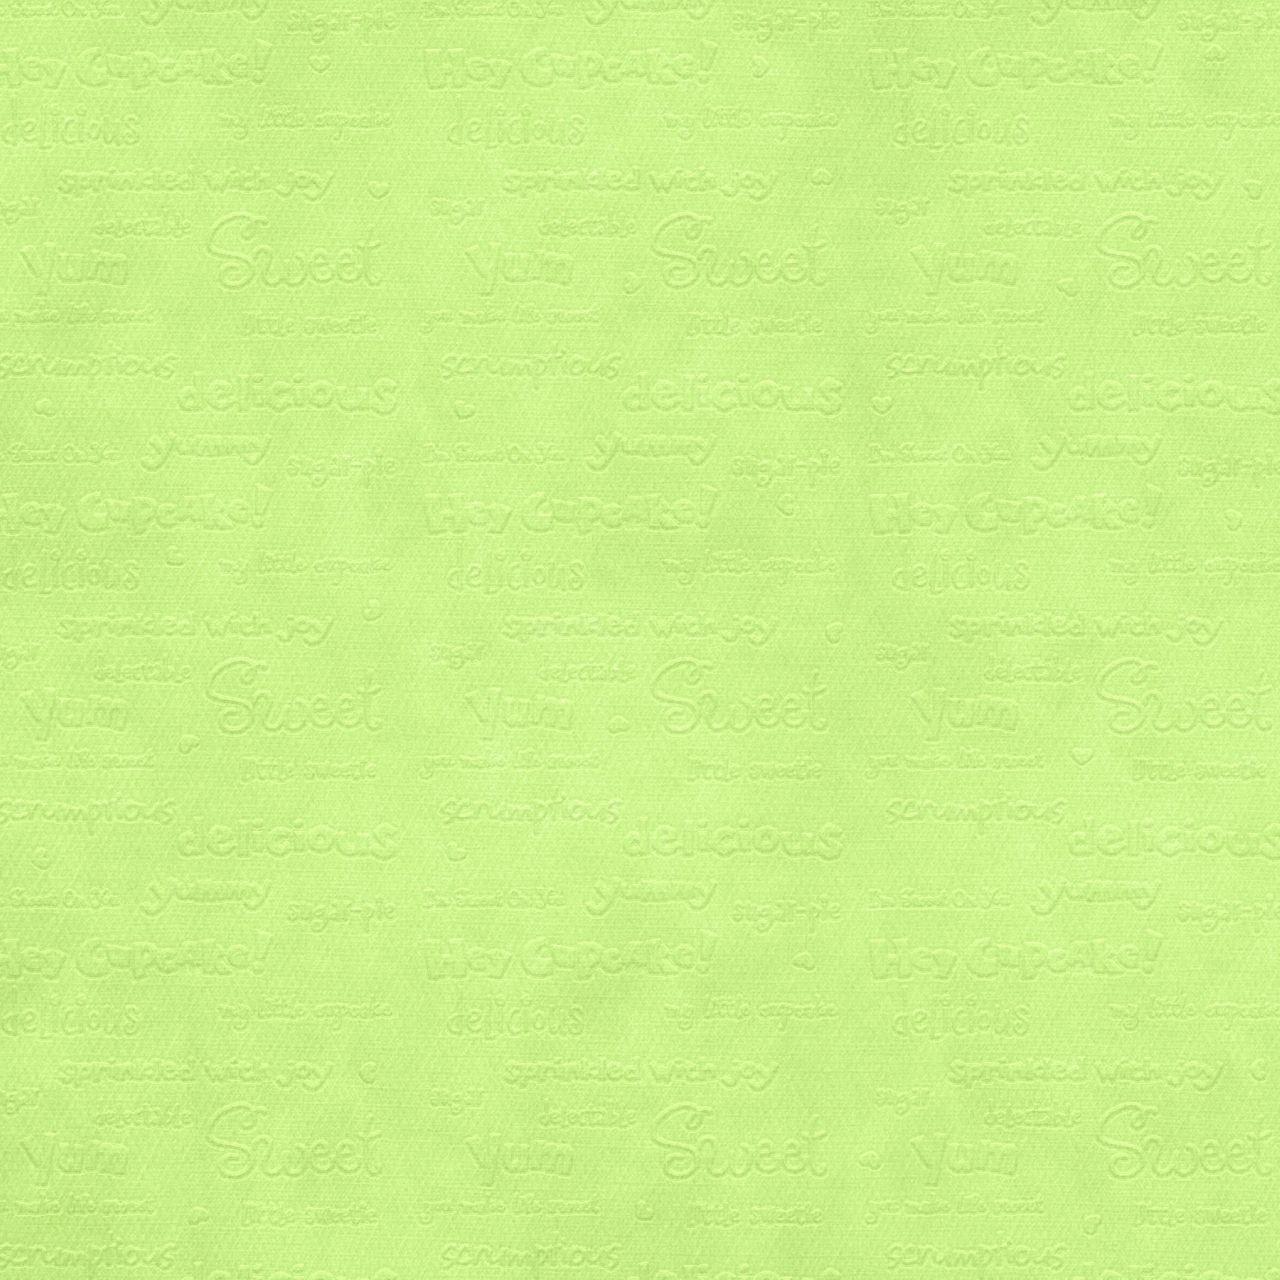 0_f4131_1d2ff180_orig (1280×1280)